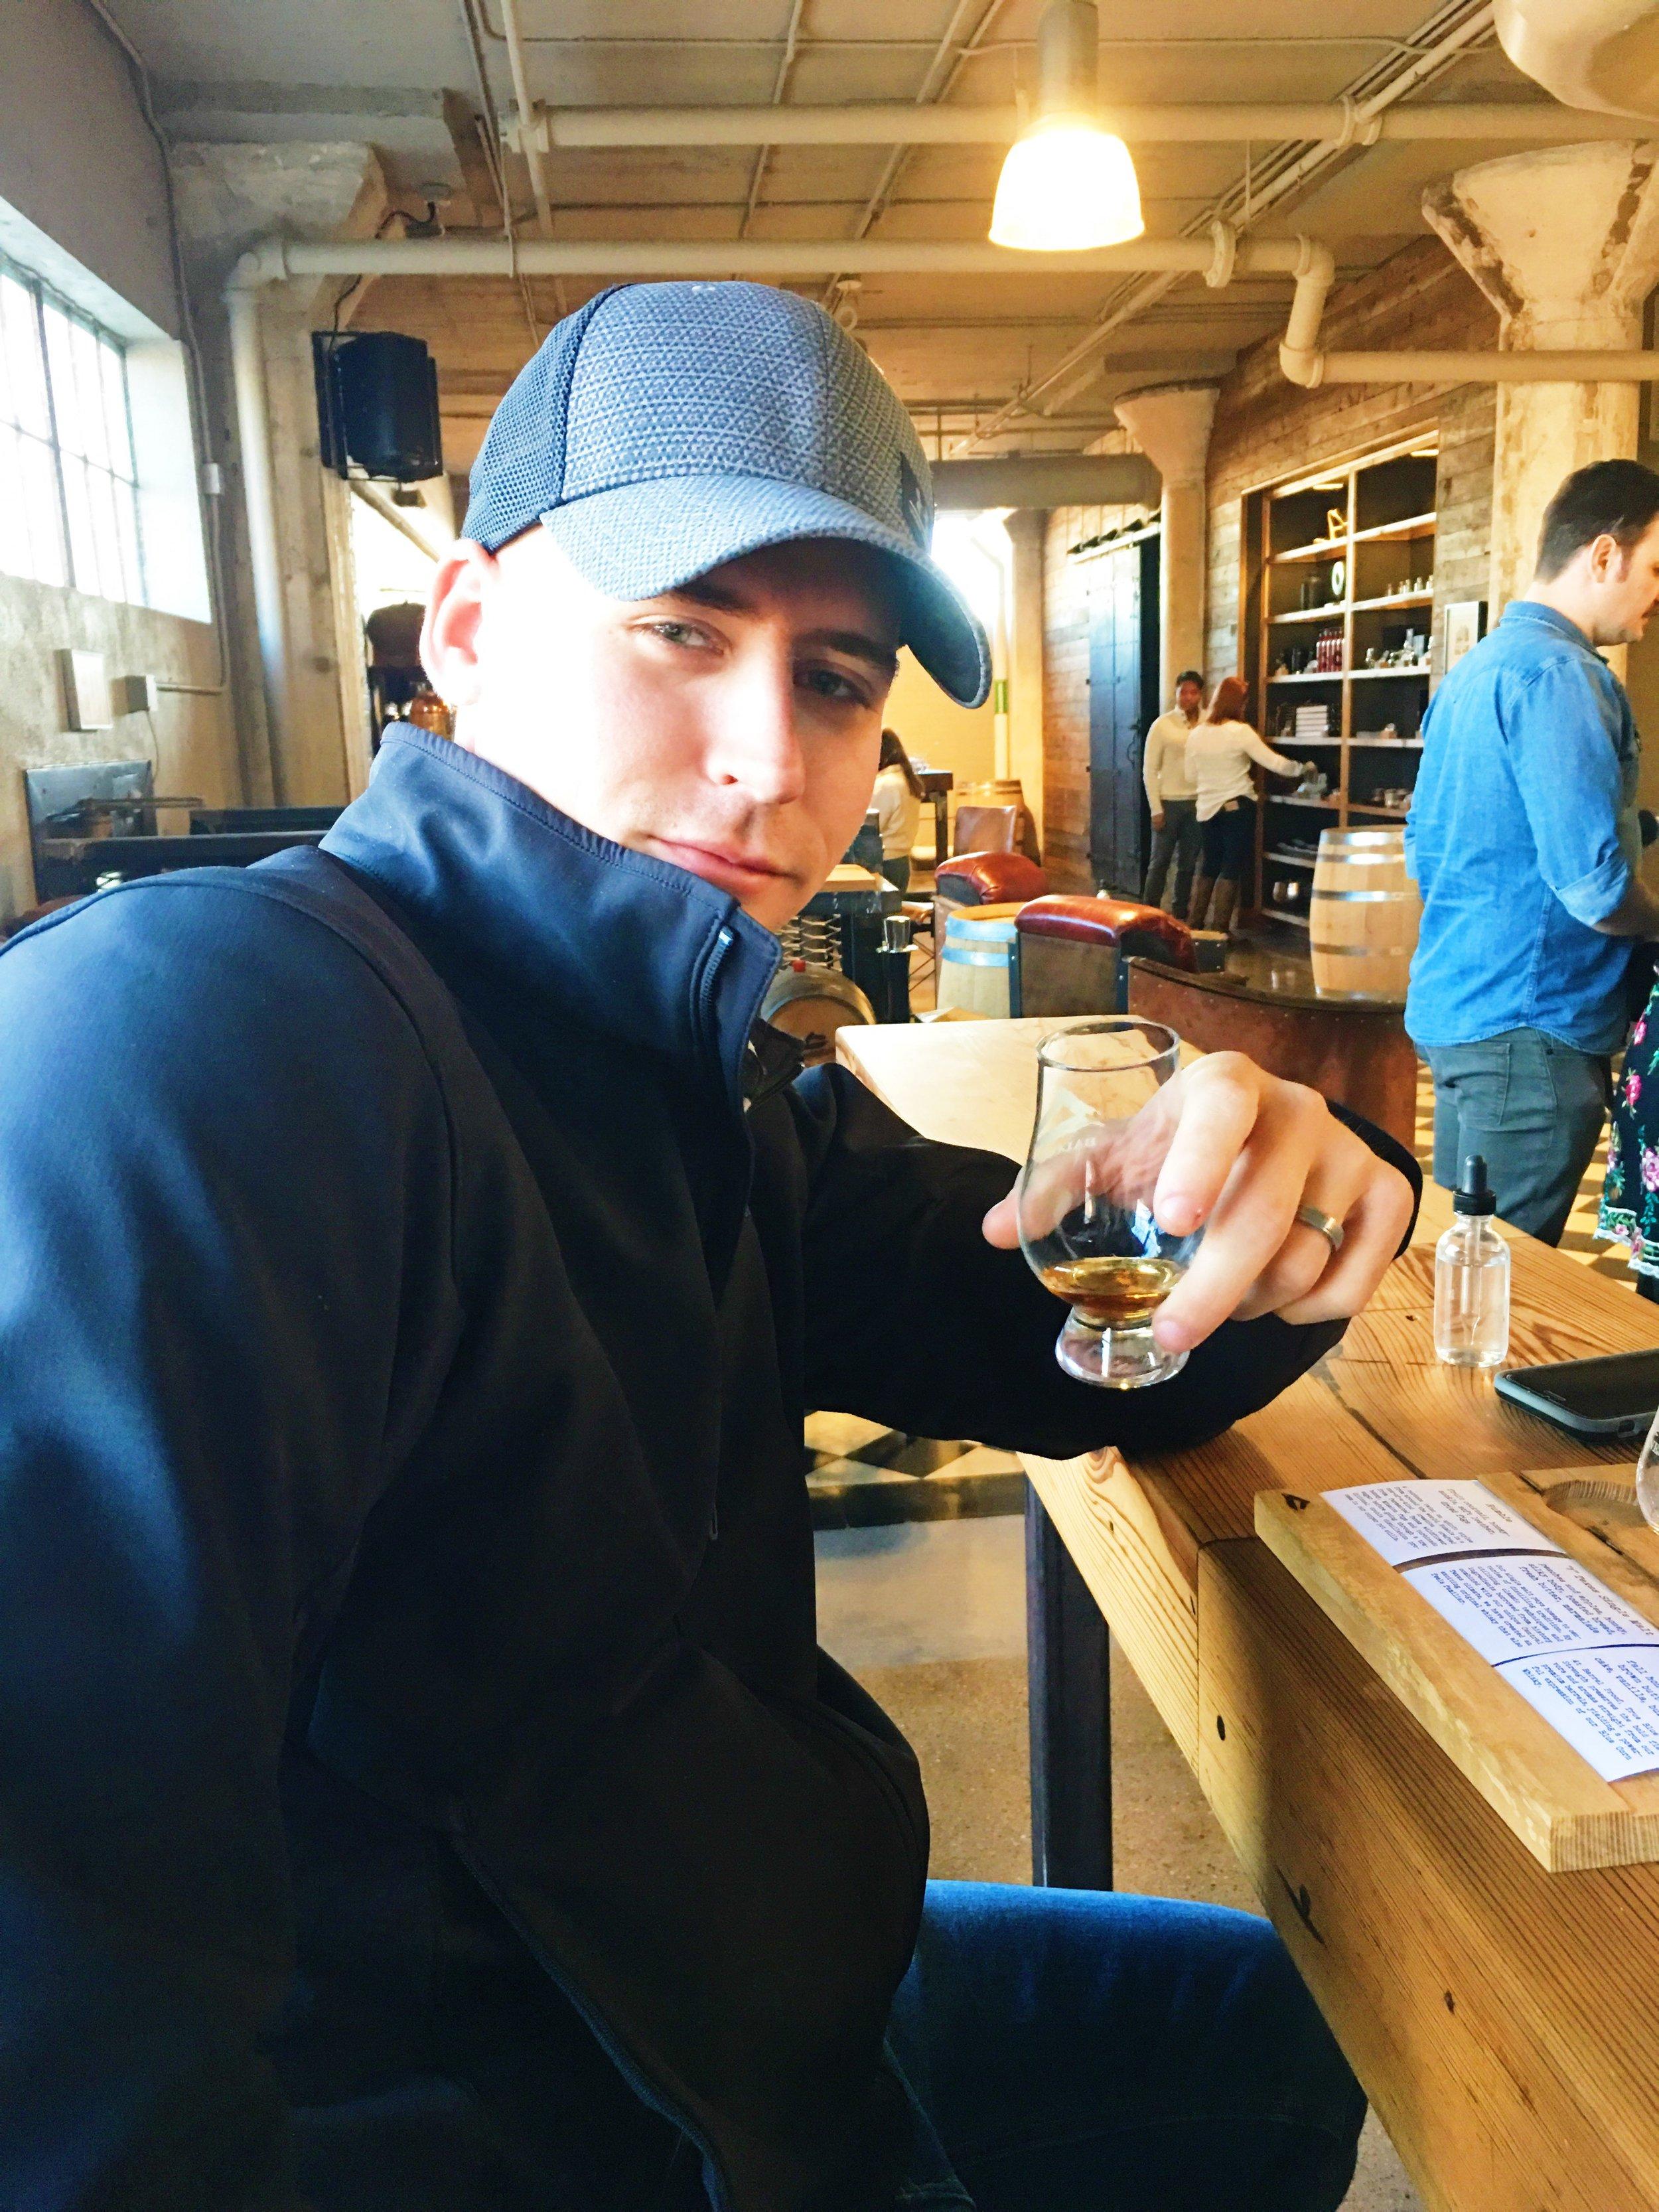 Balcones Whiskey - Things to do in Waco - Wander Dust Blog  (5).JPG